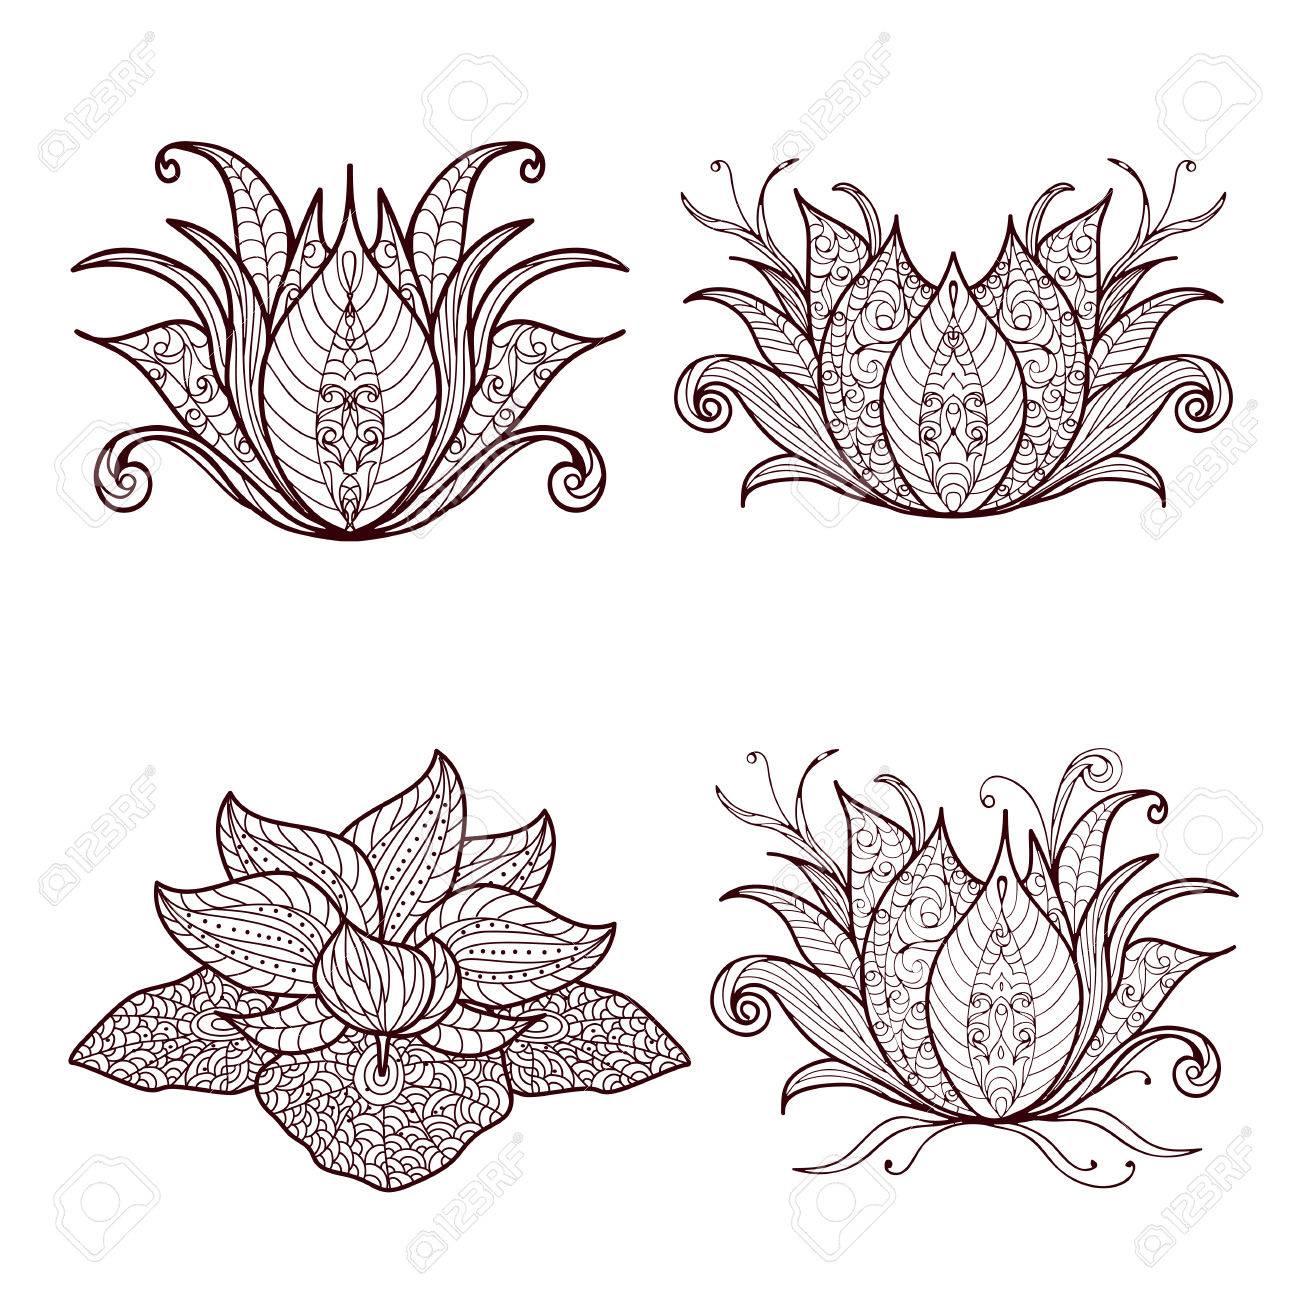 Fiore Di Loto Tattoo Disegno.Vettoriale A Mano Insieme Di Elementi Disegnati Henne Fiore Di